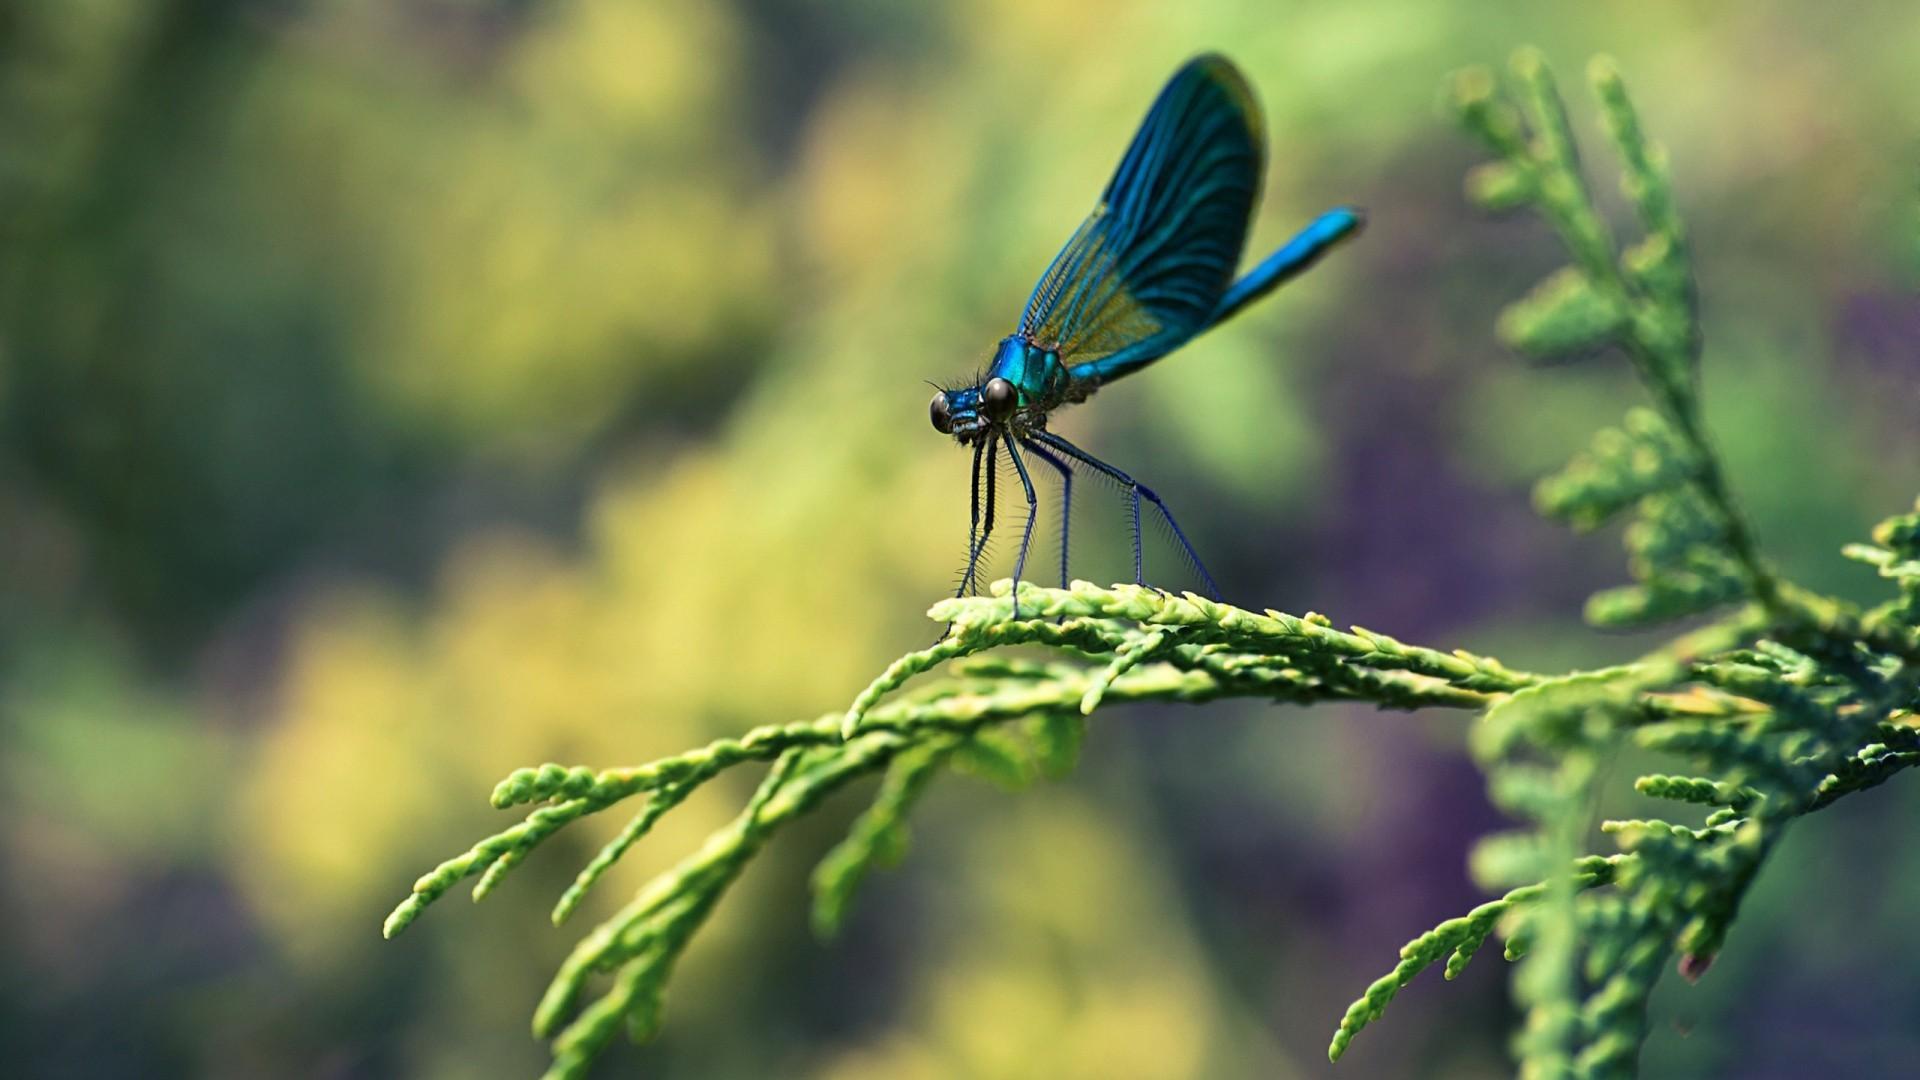 MACRO wallpaper | Blue Dragonfly Macro Wallpaper – New HD Wallpapers